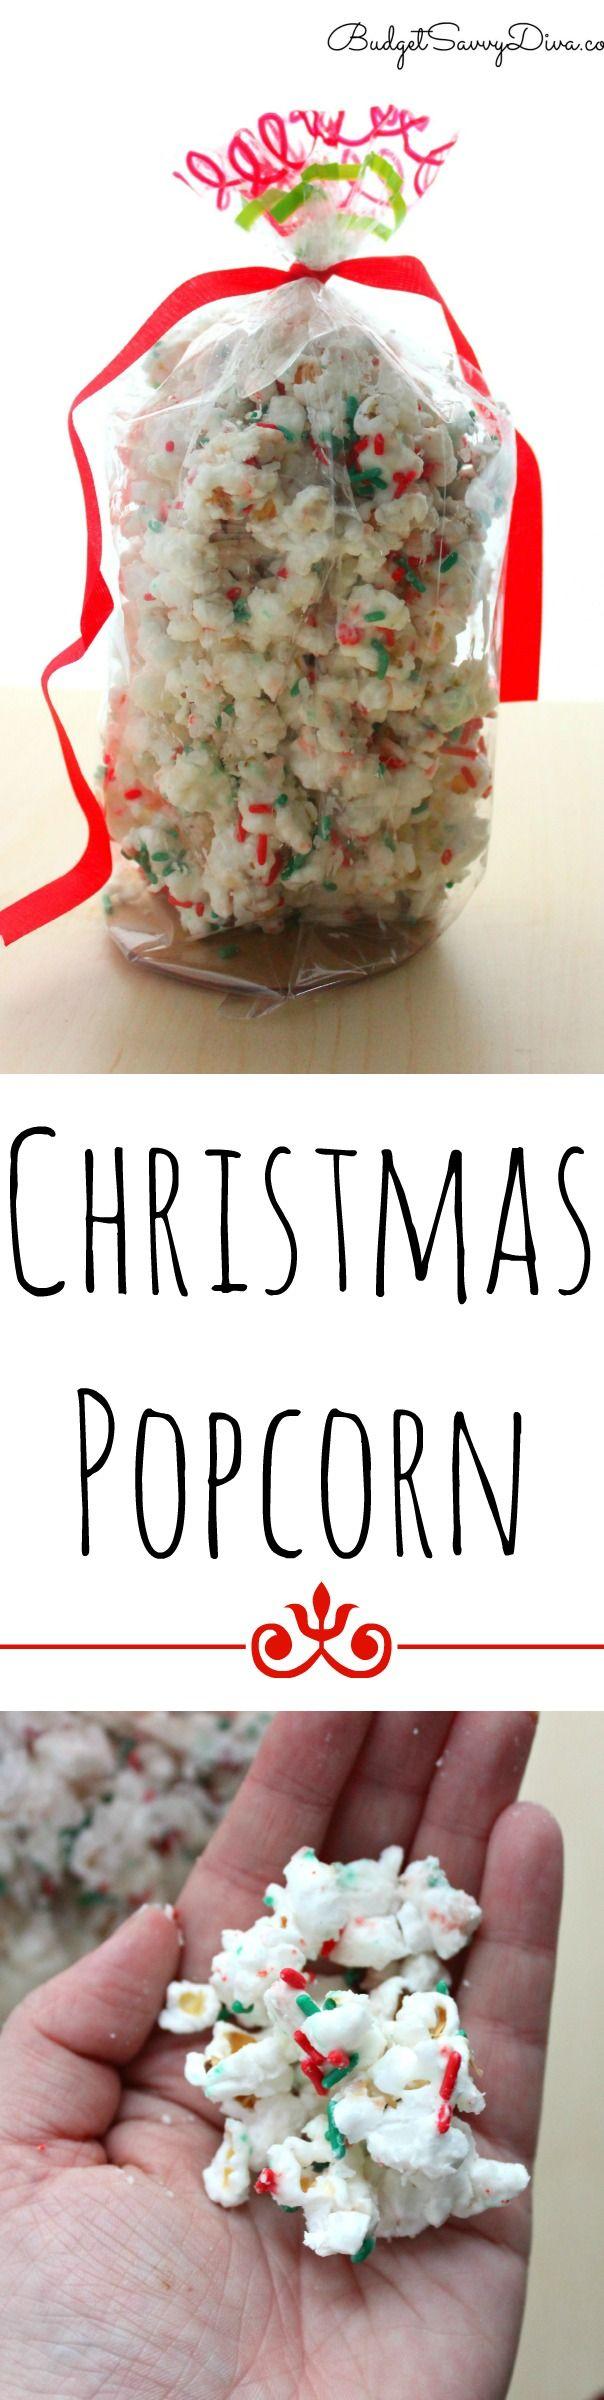 Christmas Popcorn Recipe